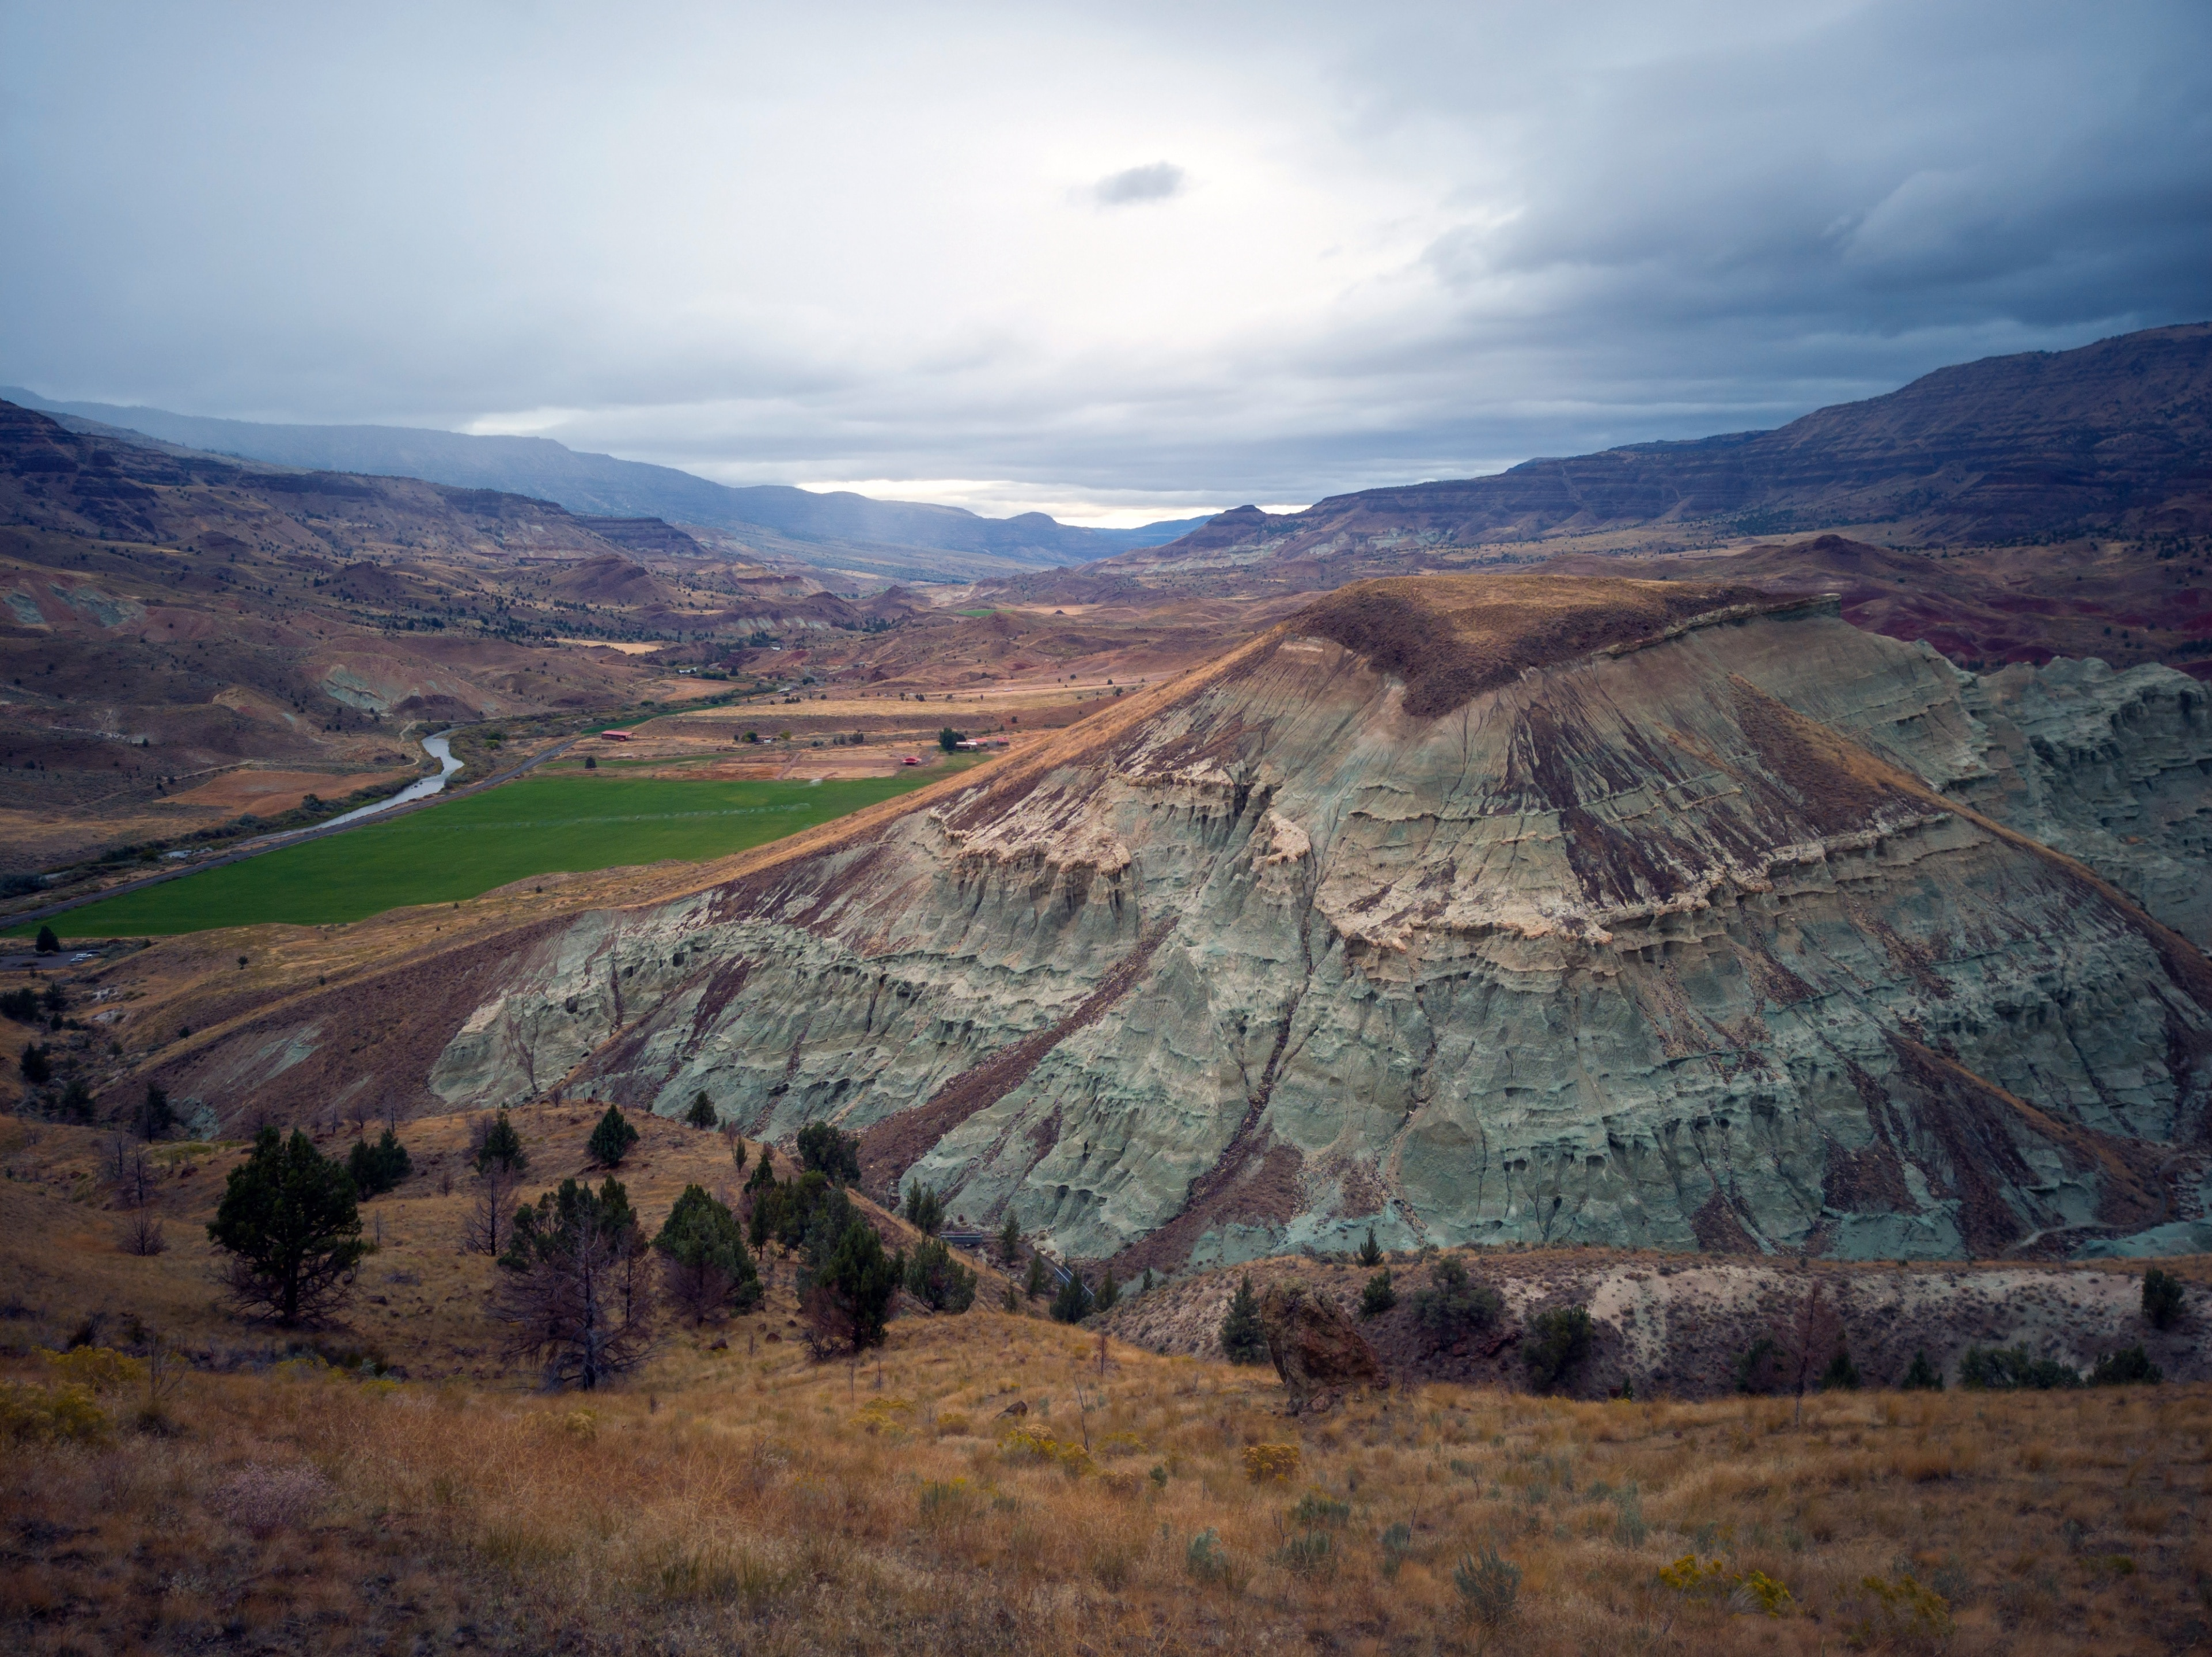 Eastern Oregon, Oregon, United States of America